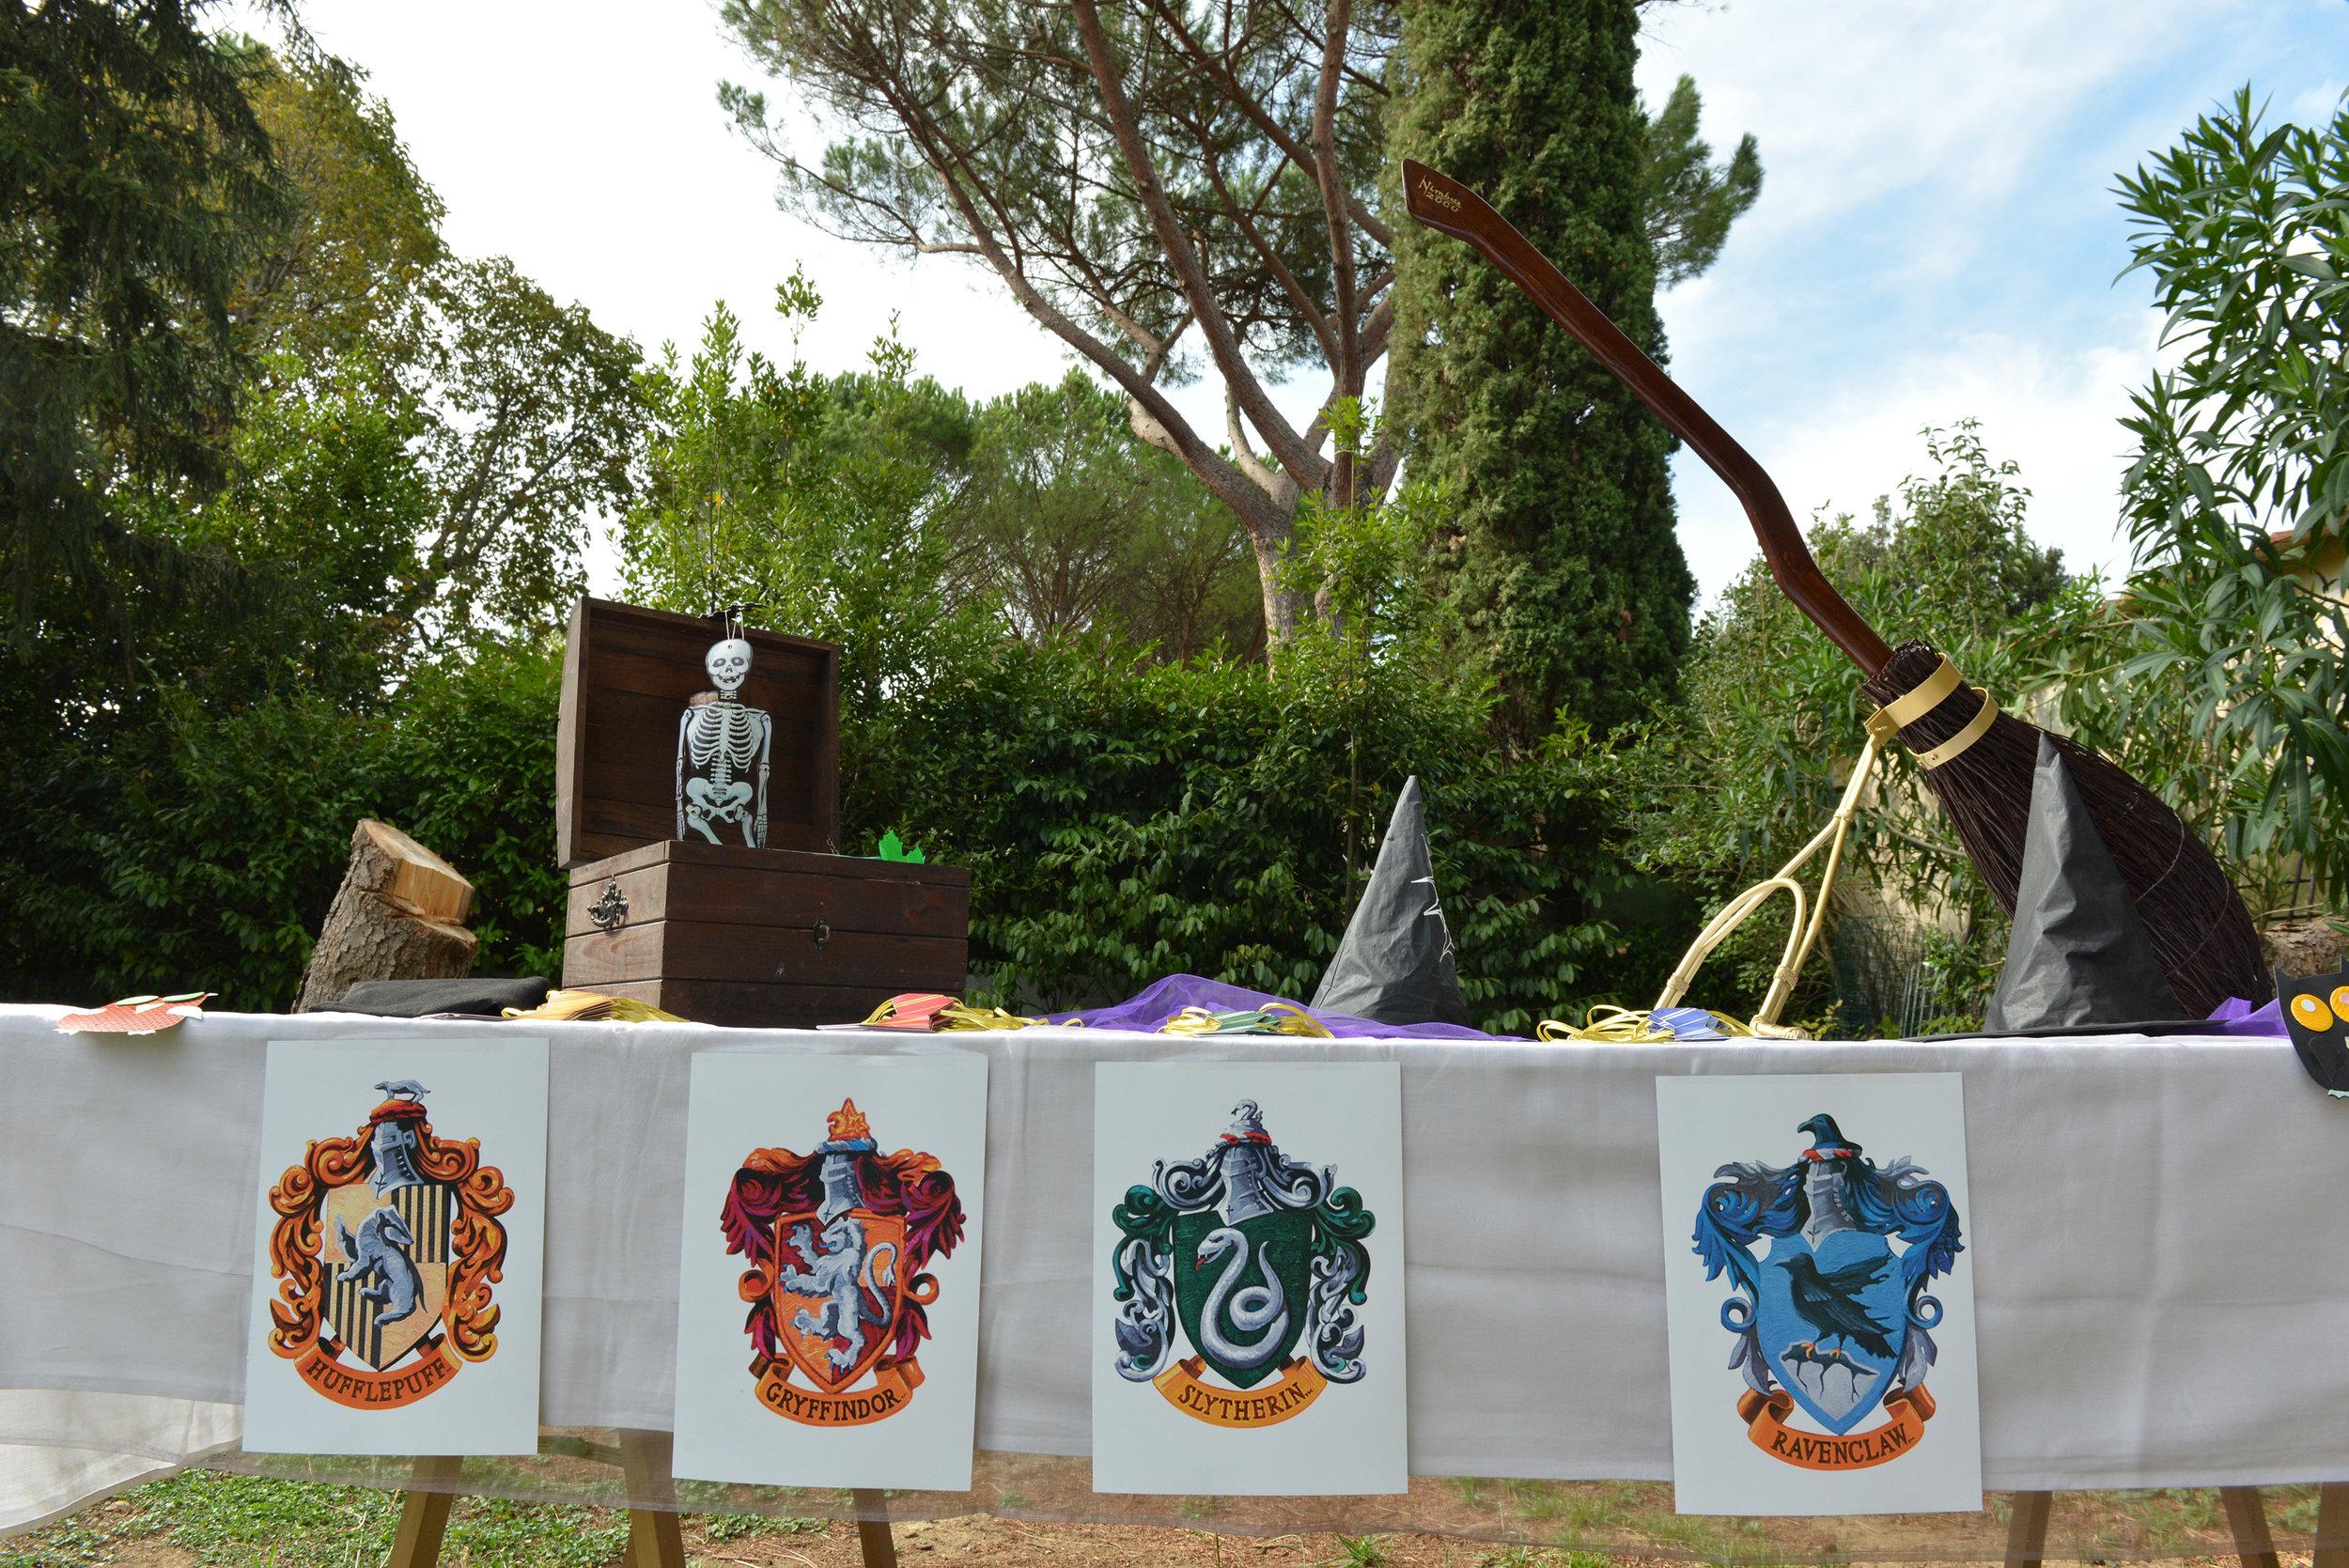 festa-a-tema-harry-potter-mago-party-blog.jpg